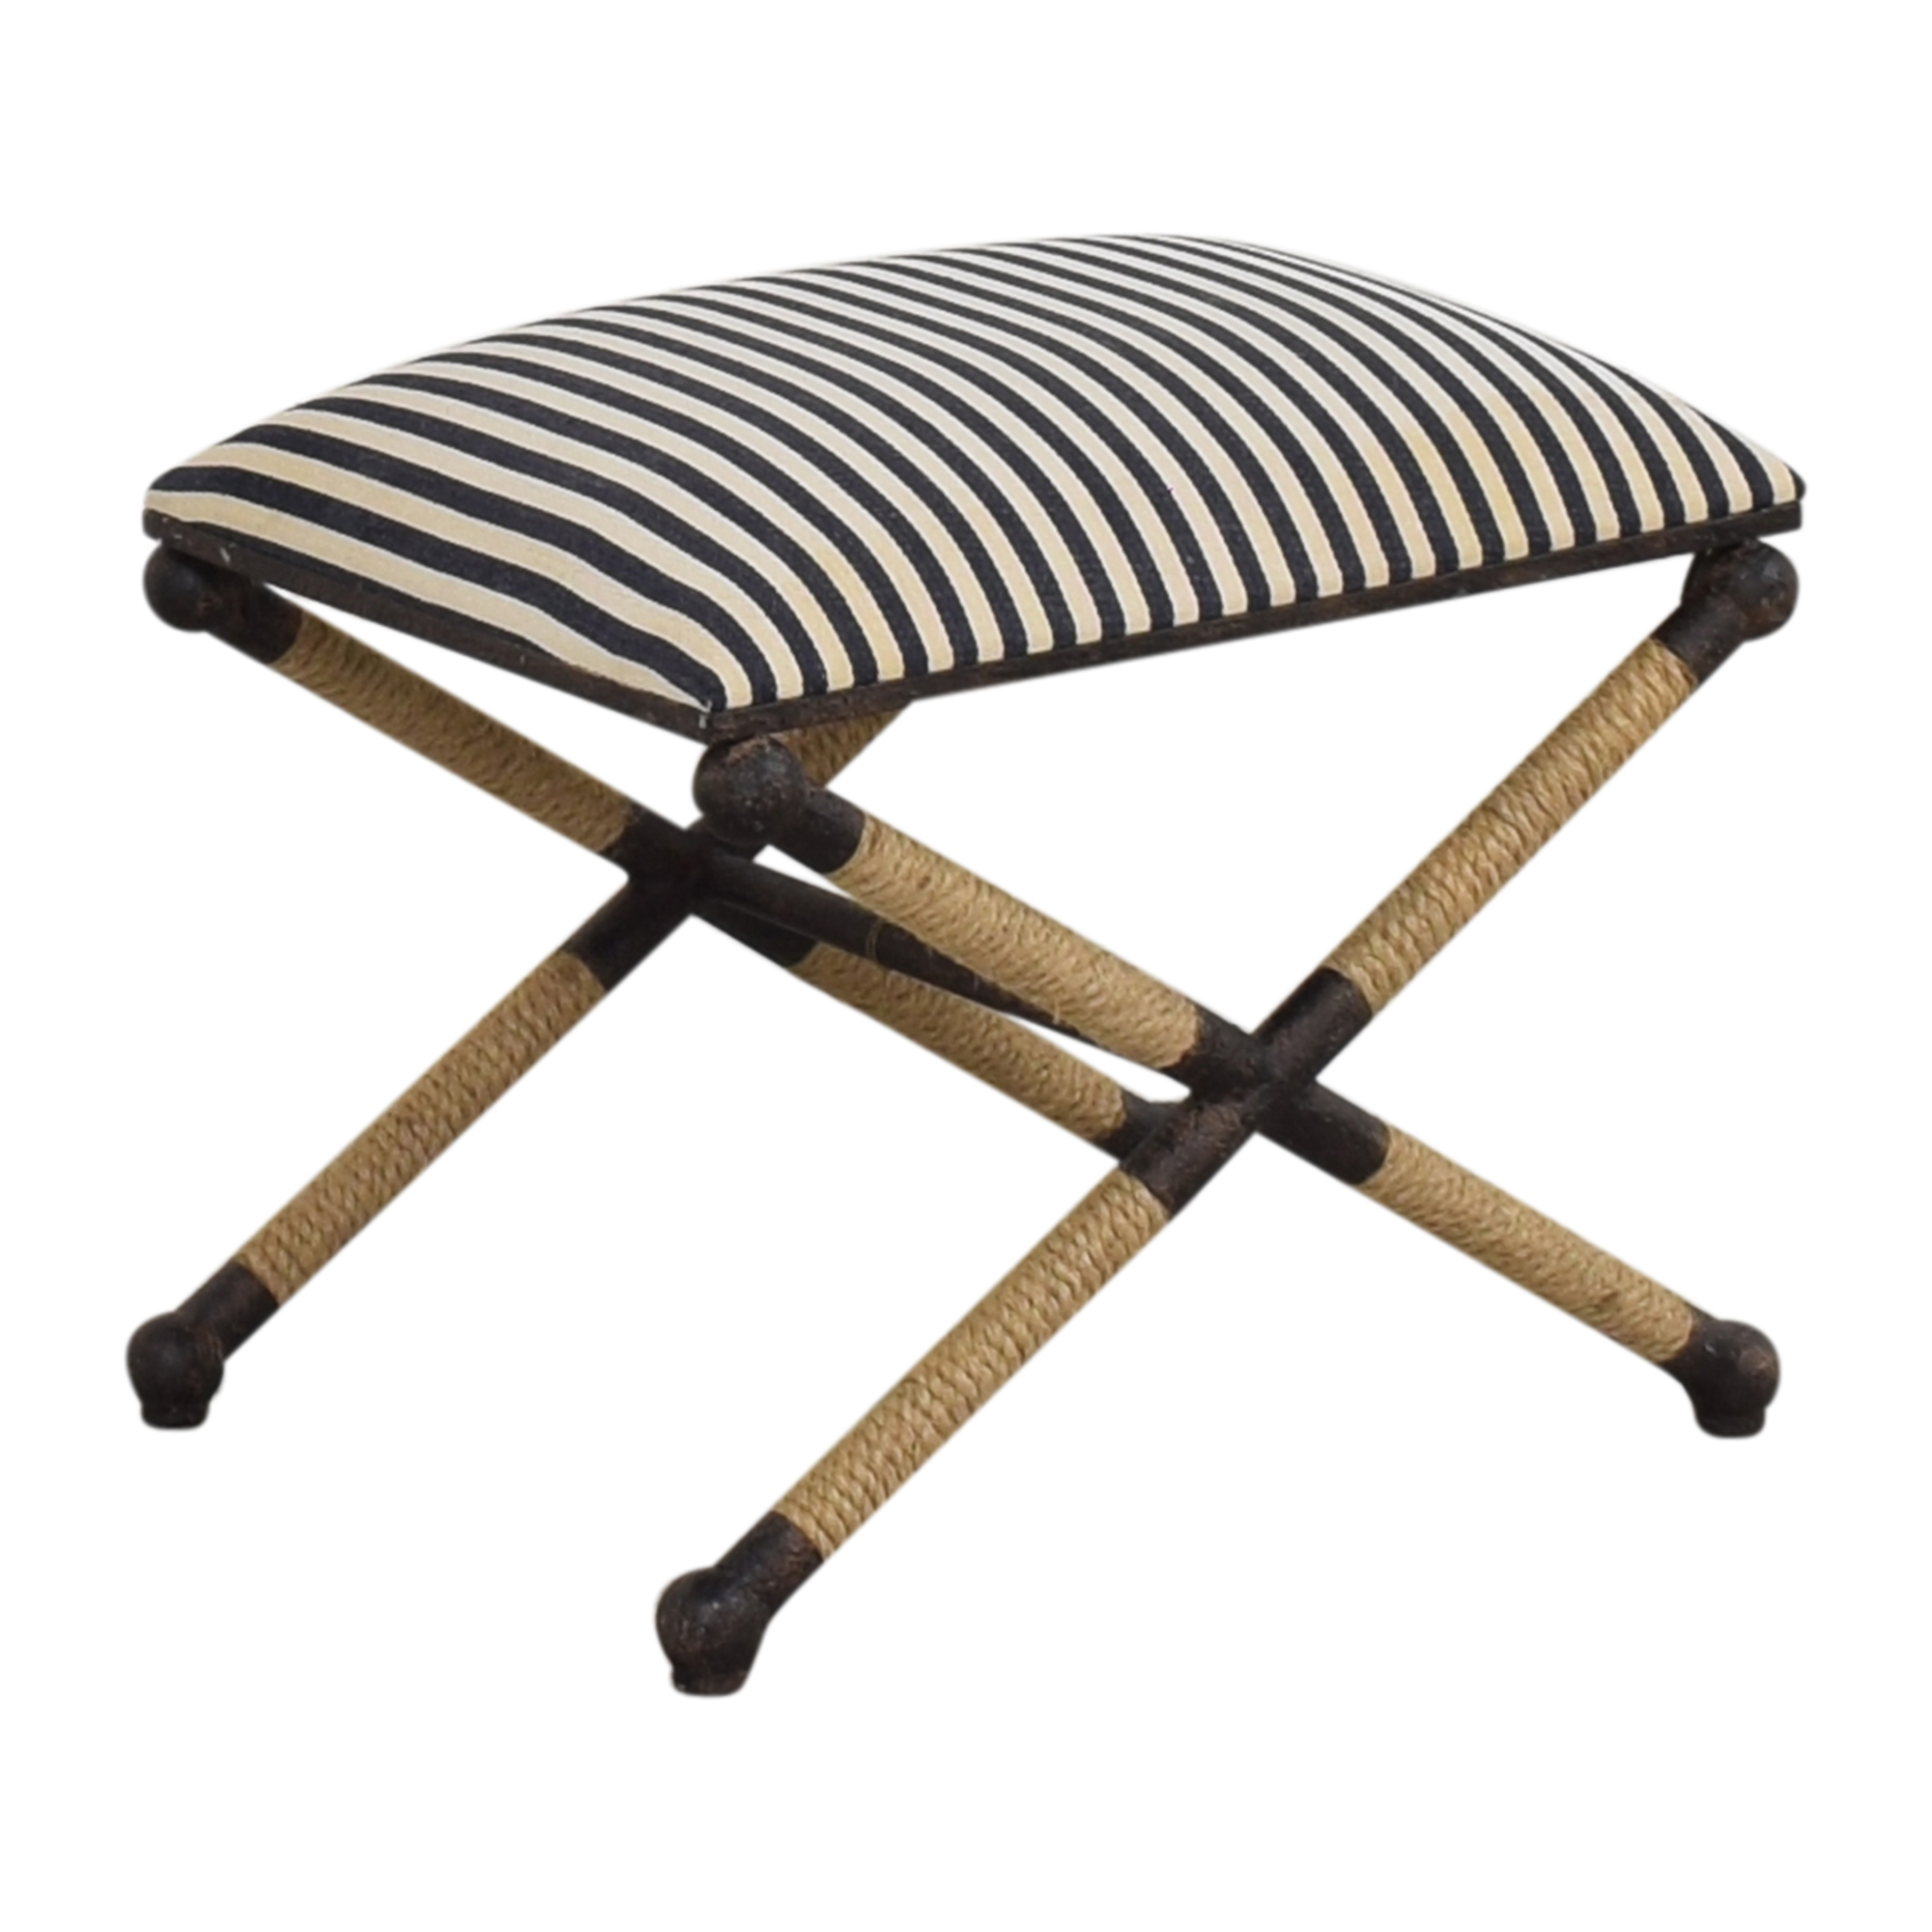 Uttermost Uttermost Braddock Small Bench Chairs